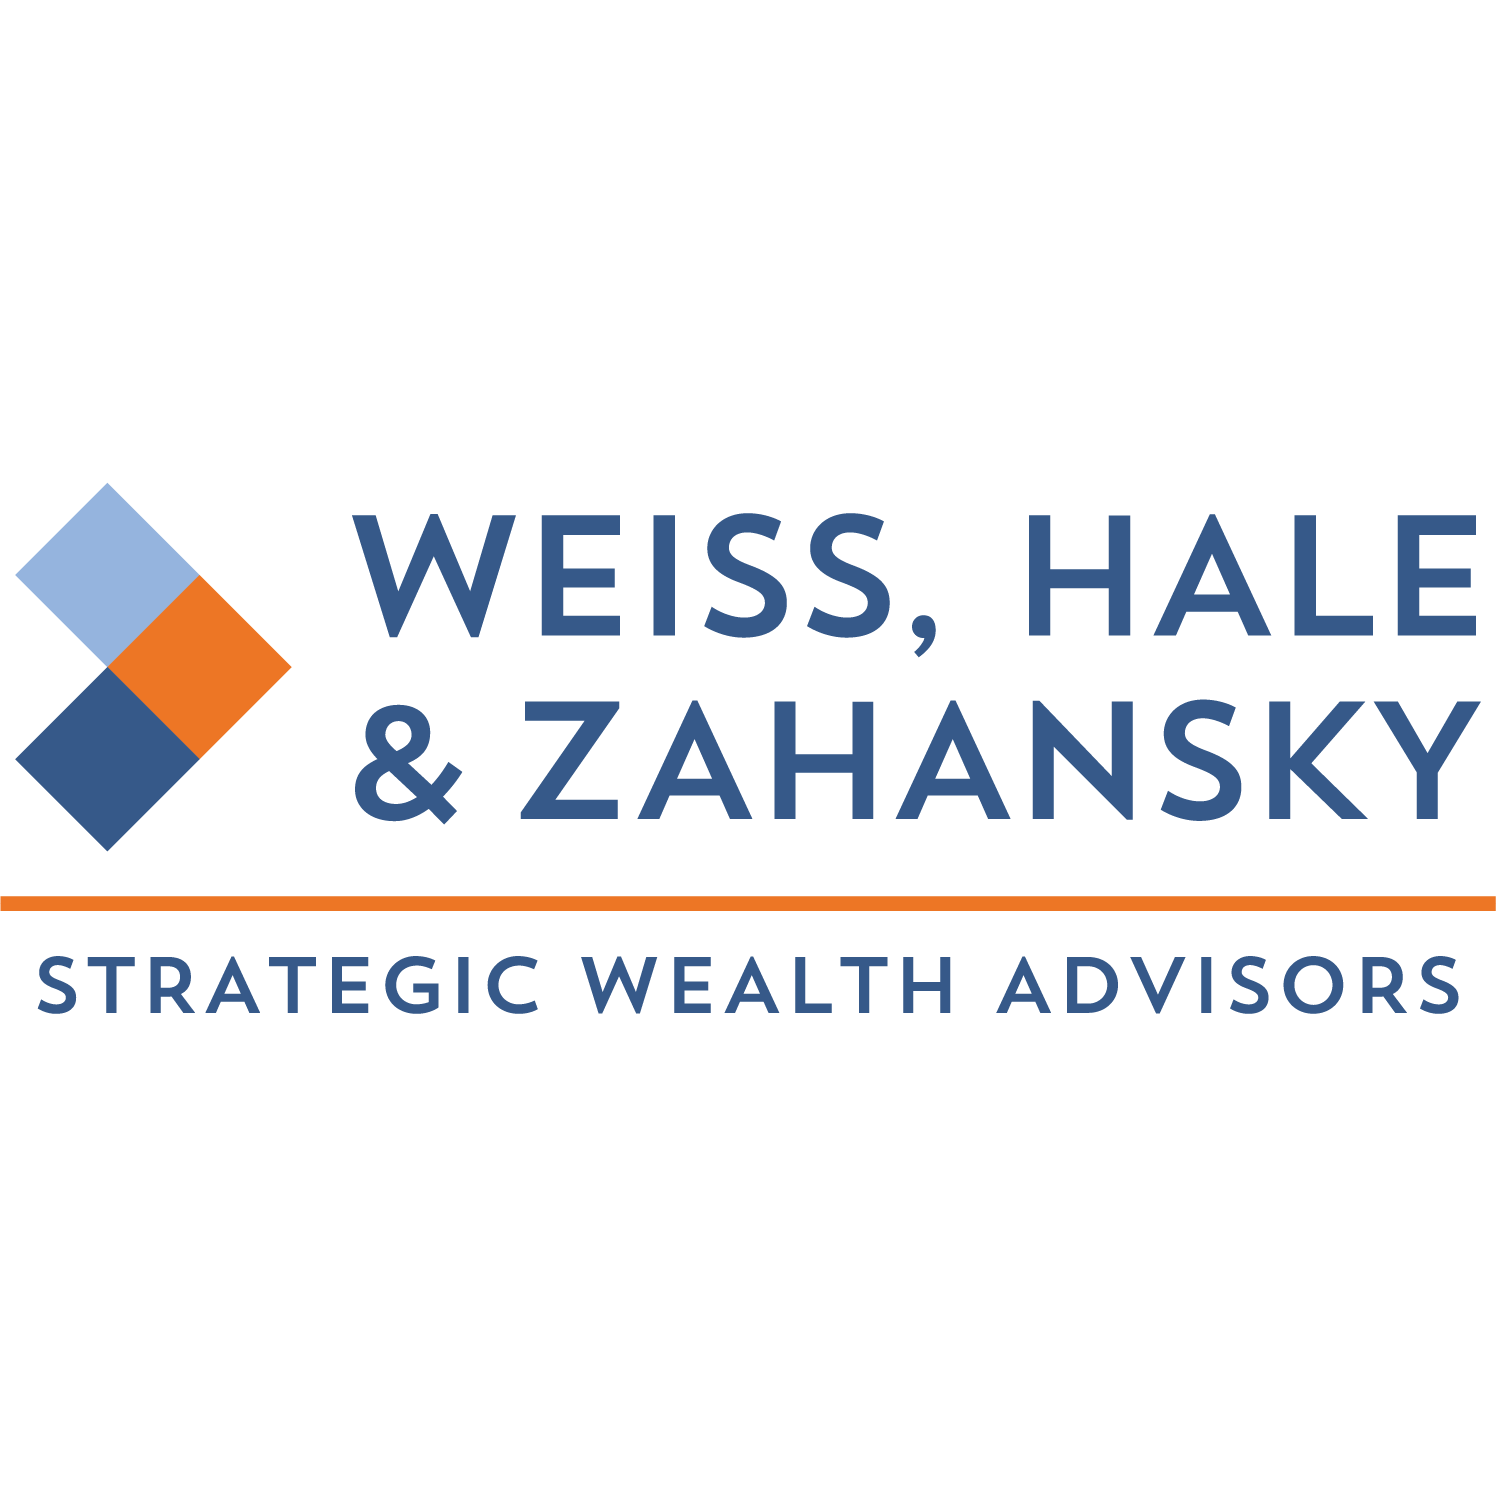 Weiss, Hale & Zahansky Strategic Wealth Advisors image 5